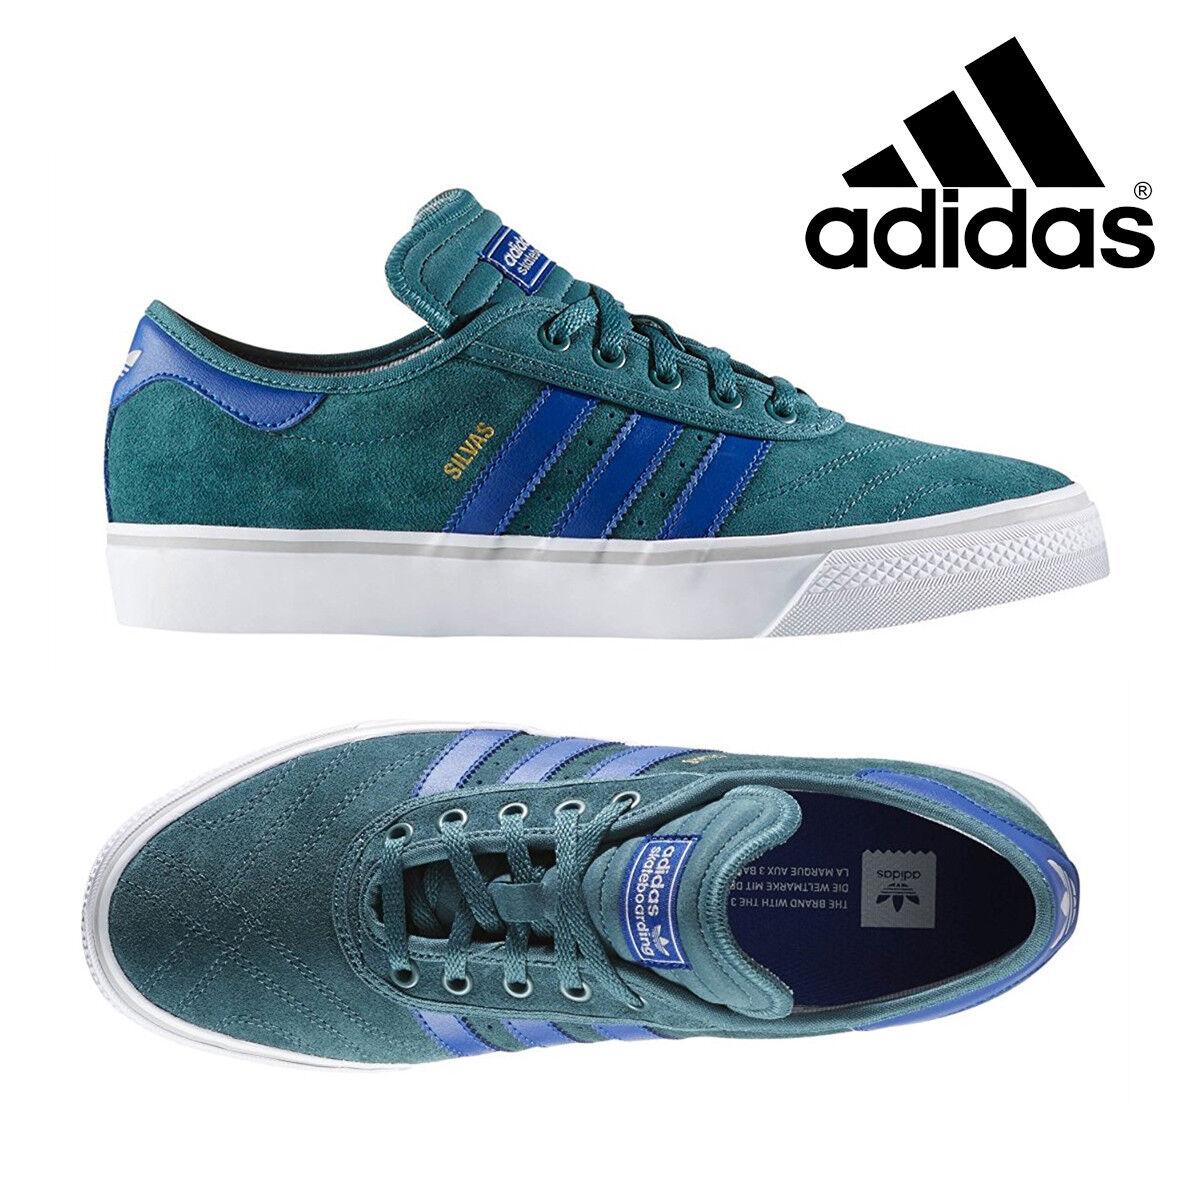 Adidas adi turnschuhe leichtigkeit premiere adv tech grüne kollegial royal turnschuhe adi bb8502 neue 1d5a47